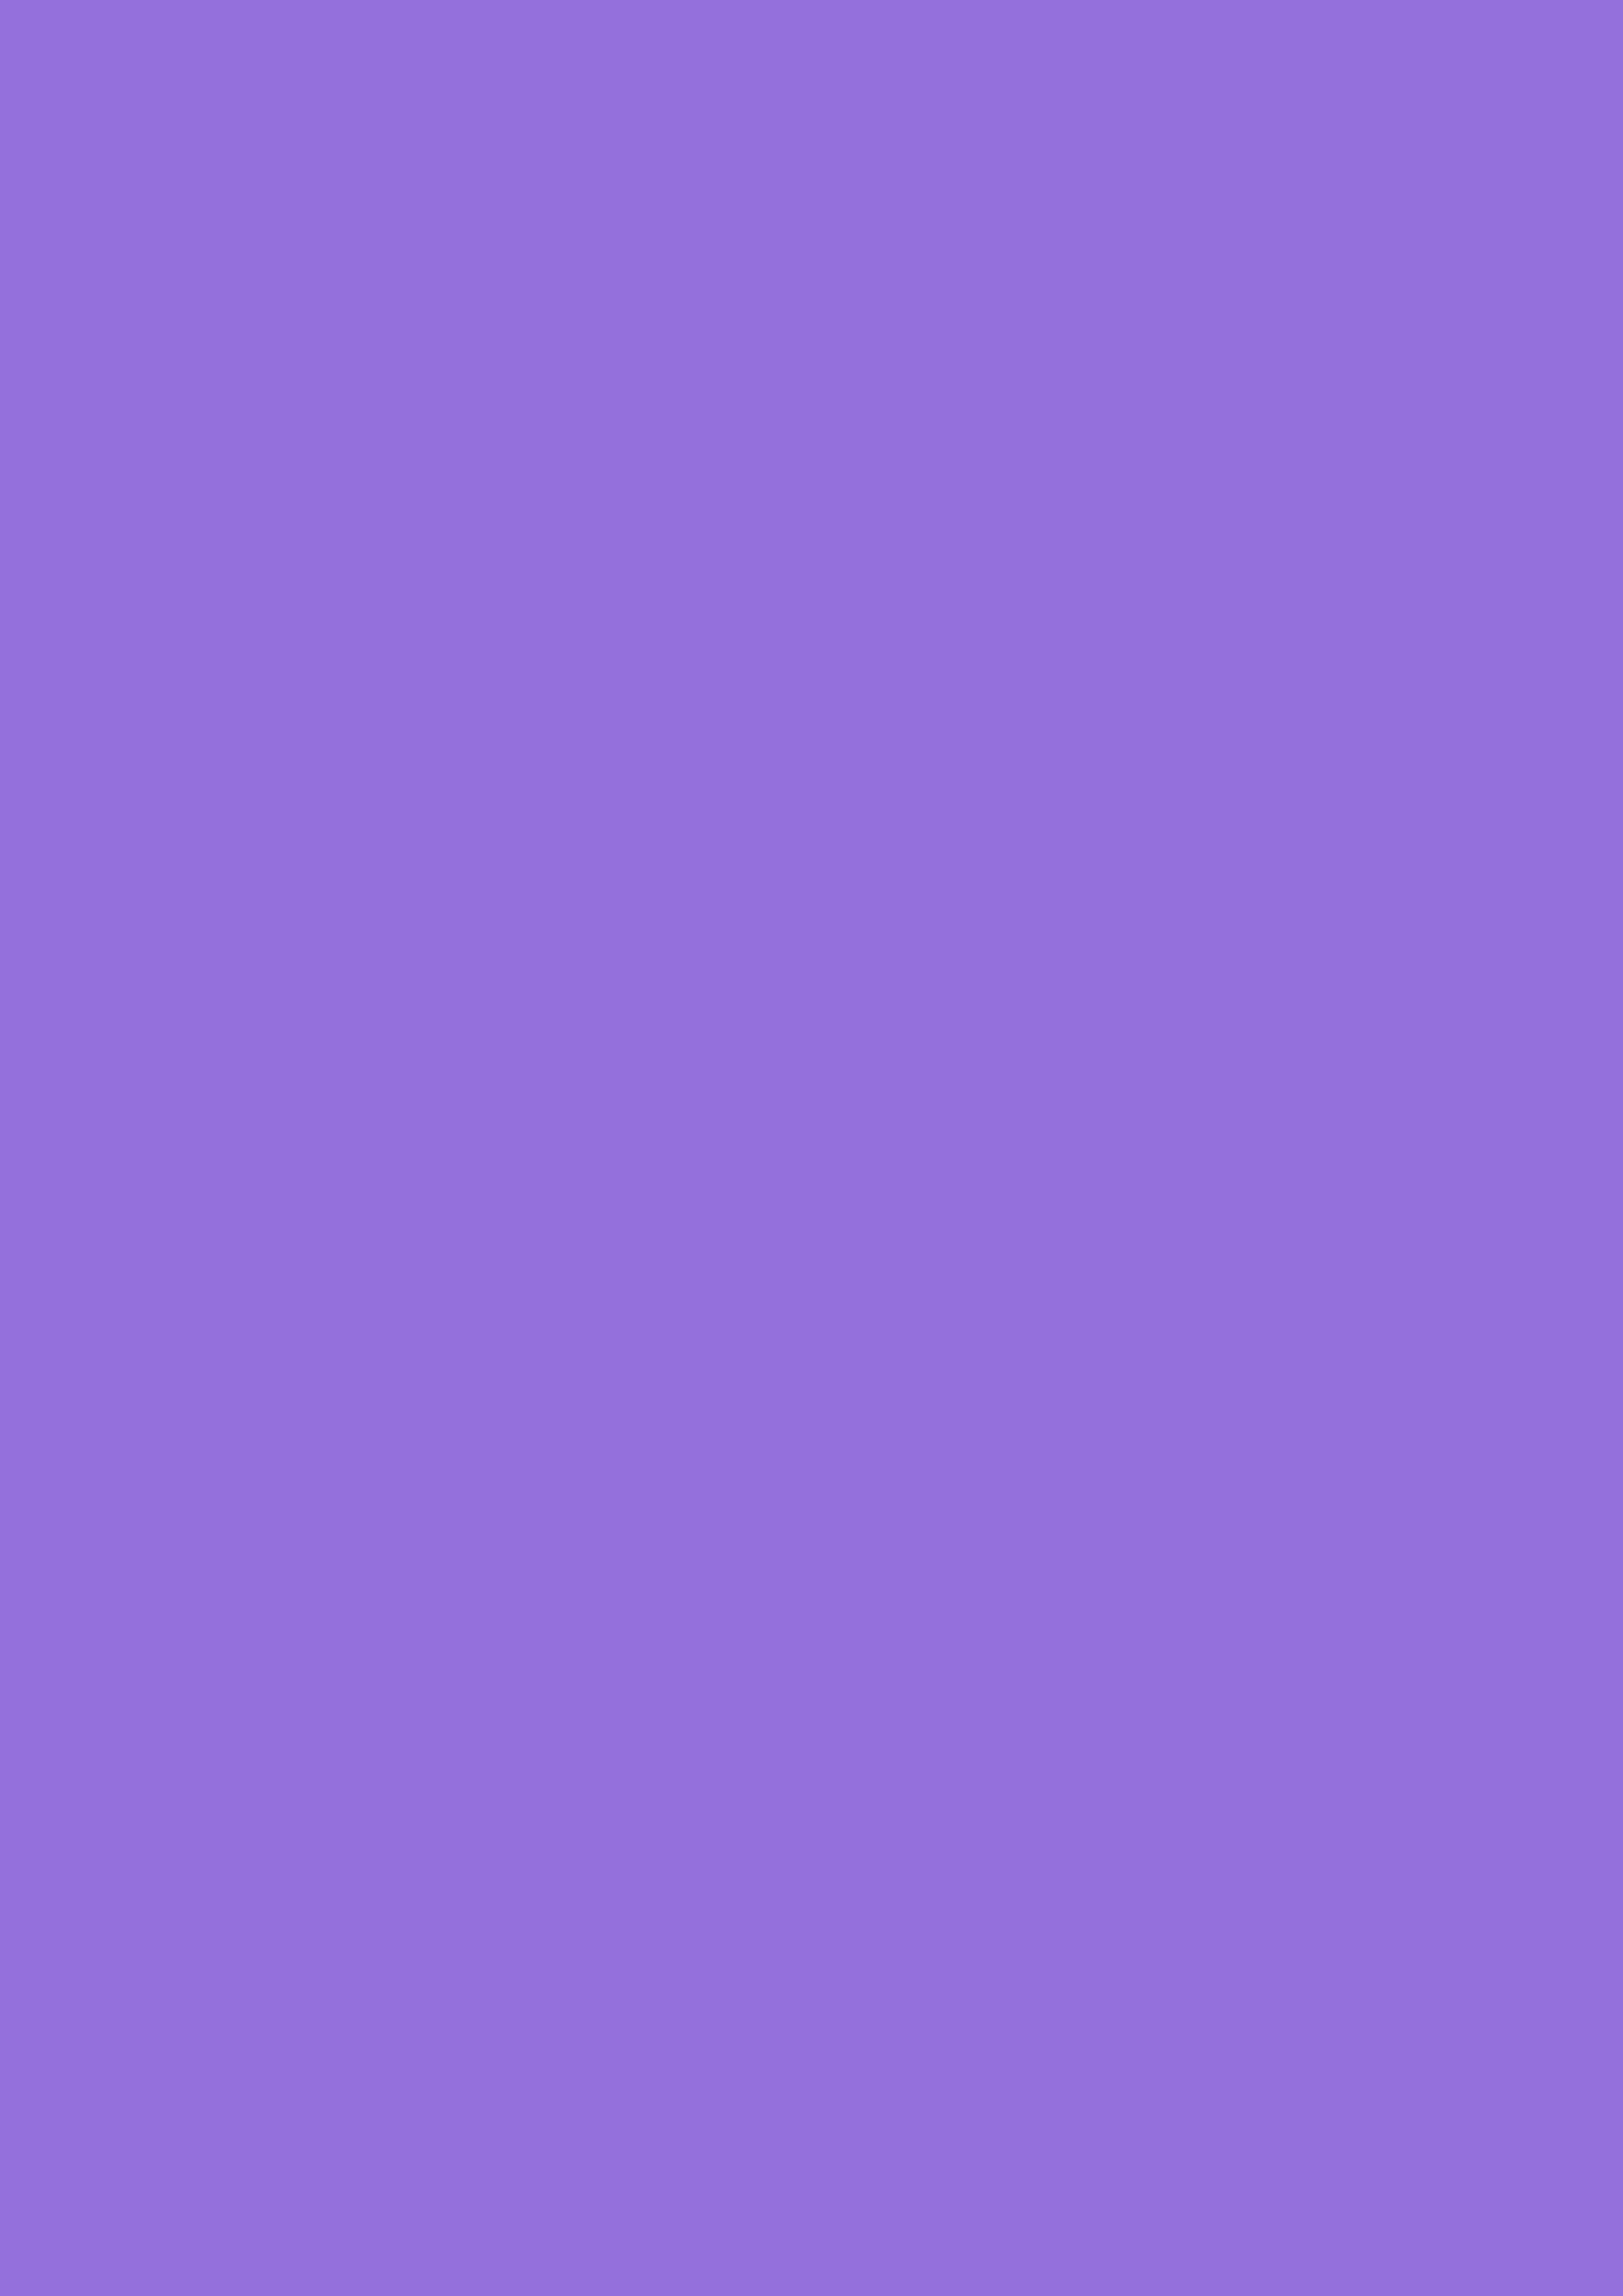 2480x3508 Medium Purple Solid Color Background